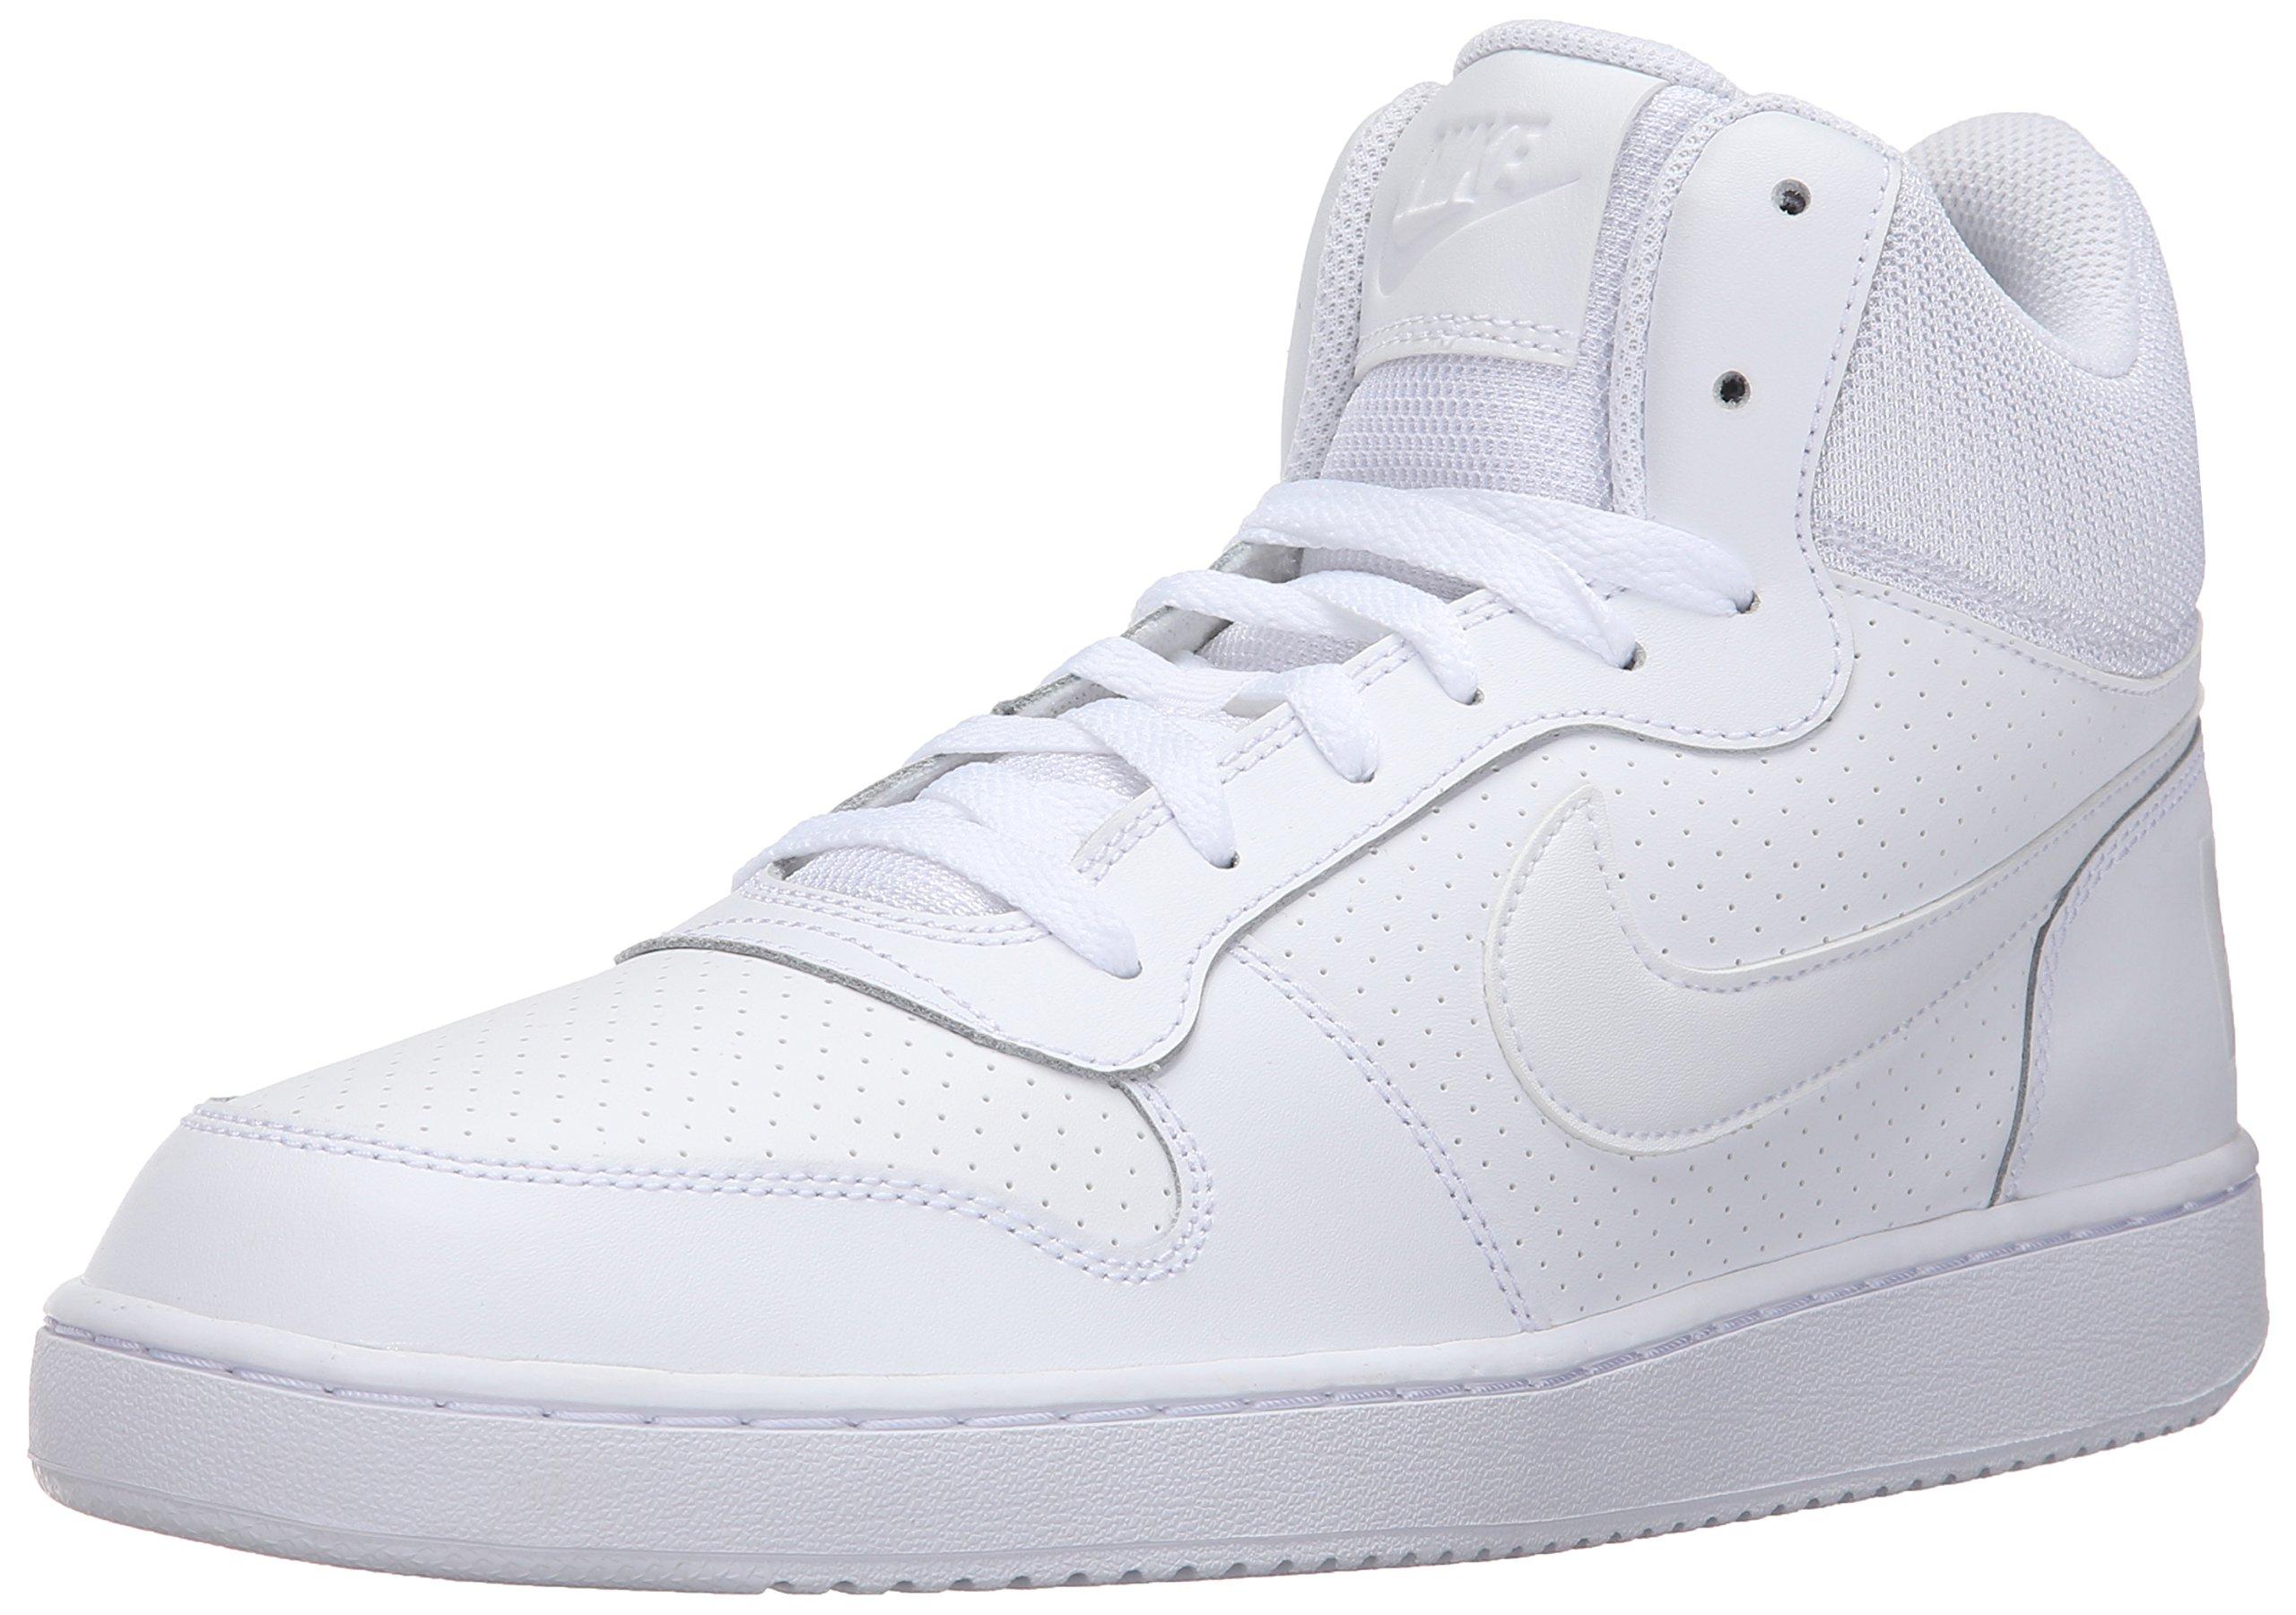 8a57a7b4acddd Galleon - NIKE Men's Court Borough Mid Basketball Sneaker,  White/White/White, 9 D(M) US